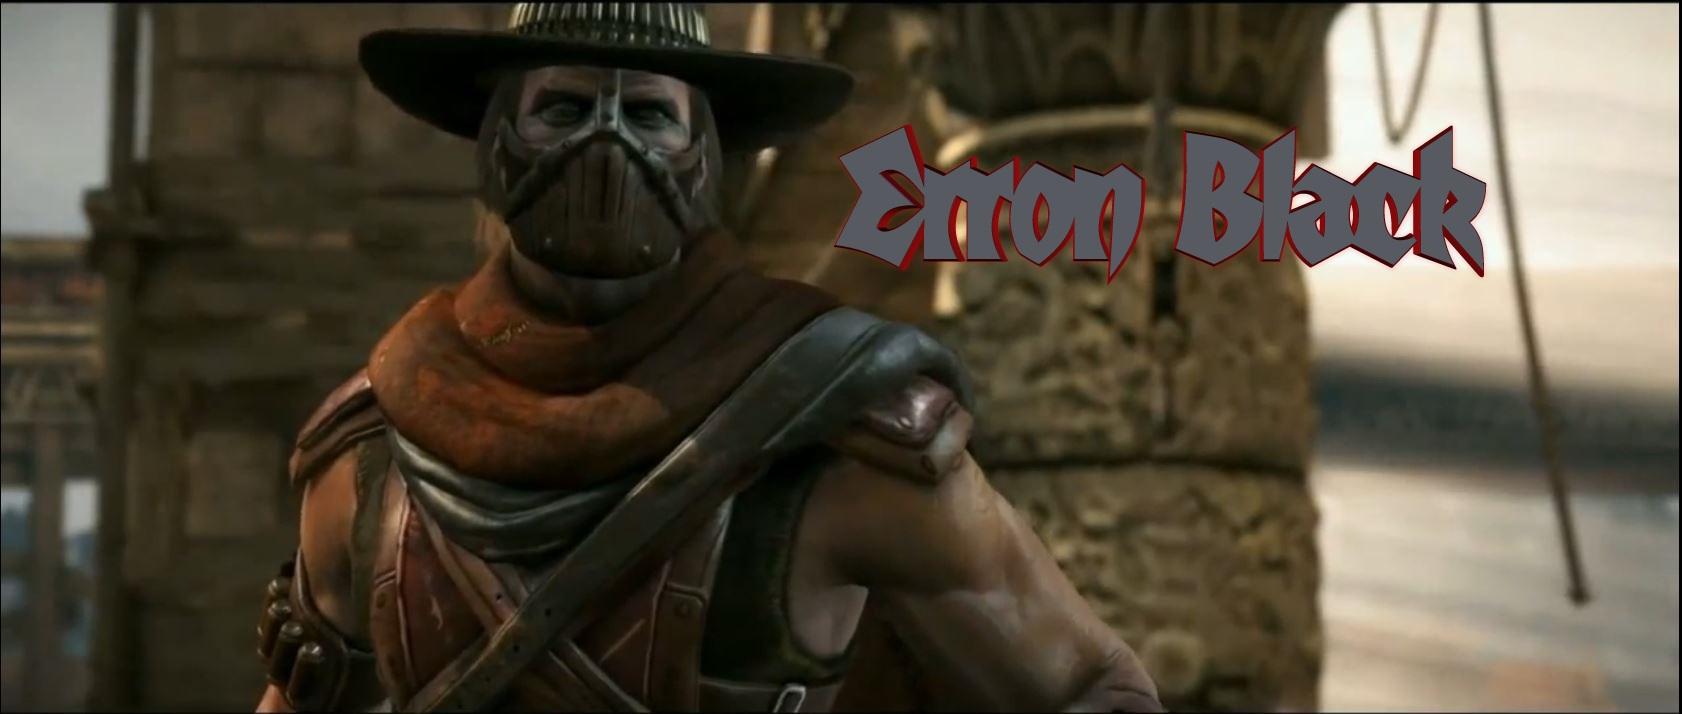 Erron Black Trailer – Mortal Kombat X